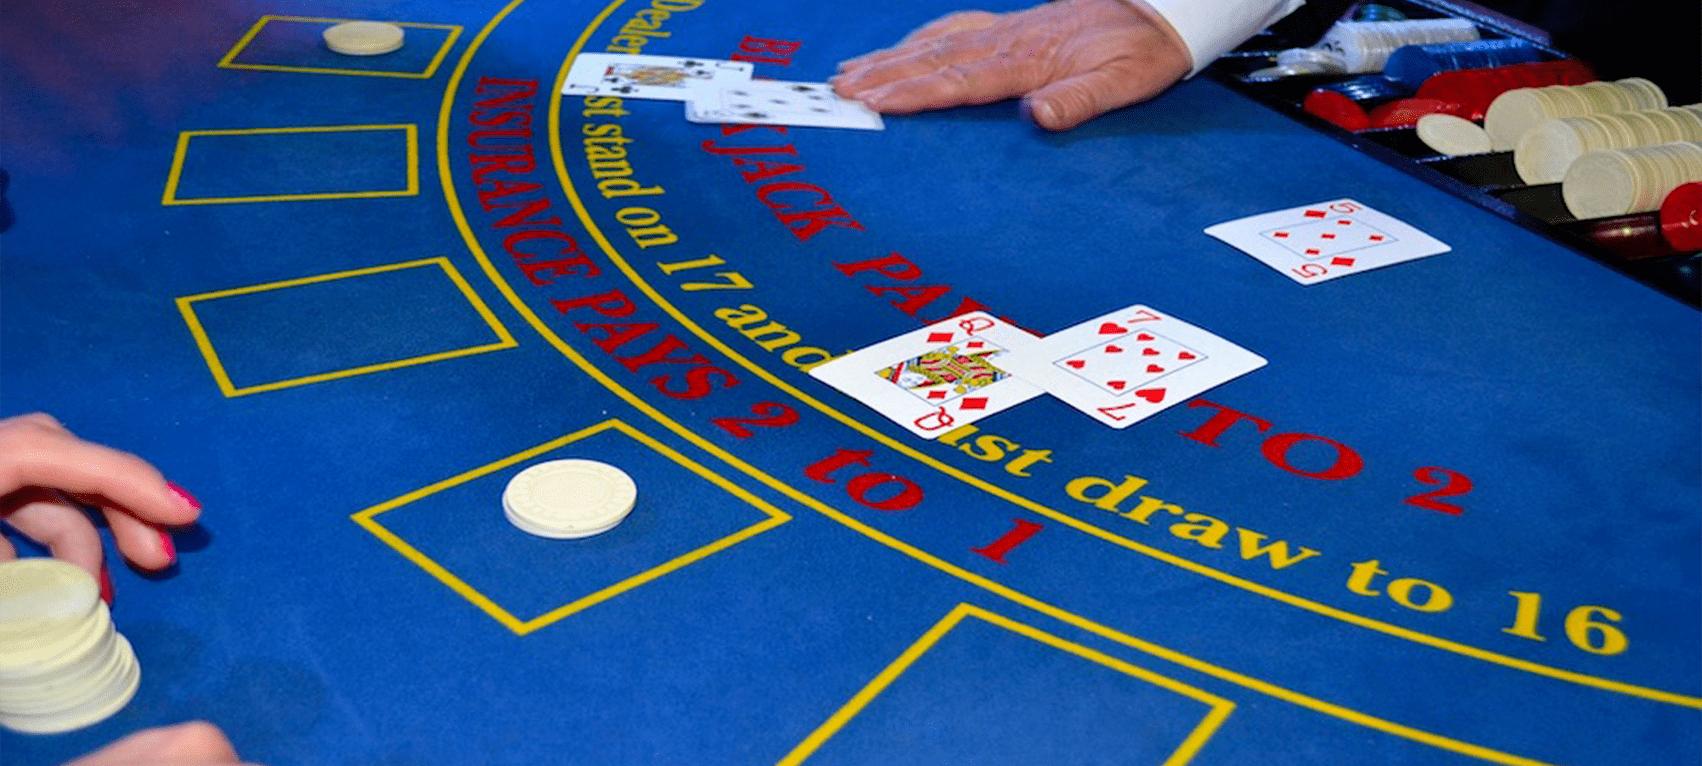 https://www.gambleonline.co/app/uploads/2021/04/casino-dealer-1.png